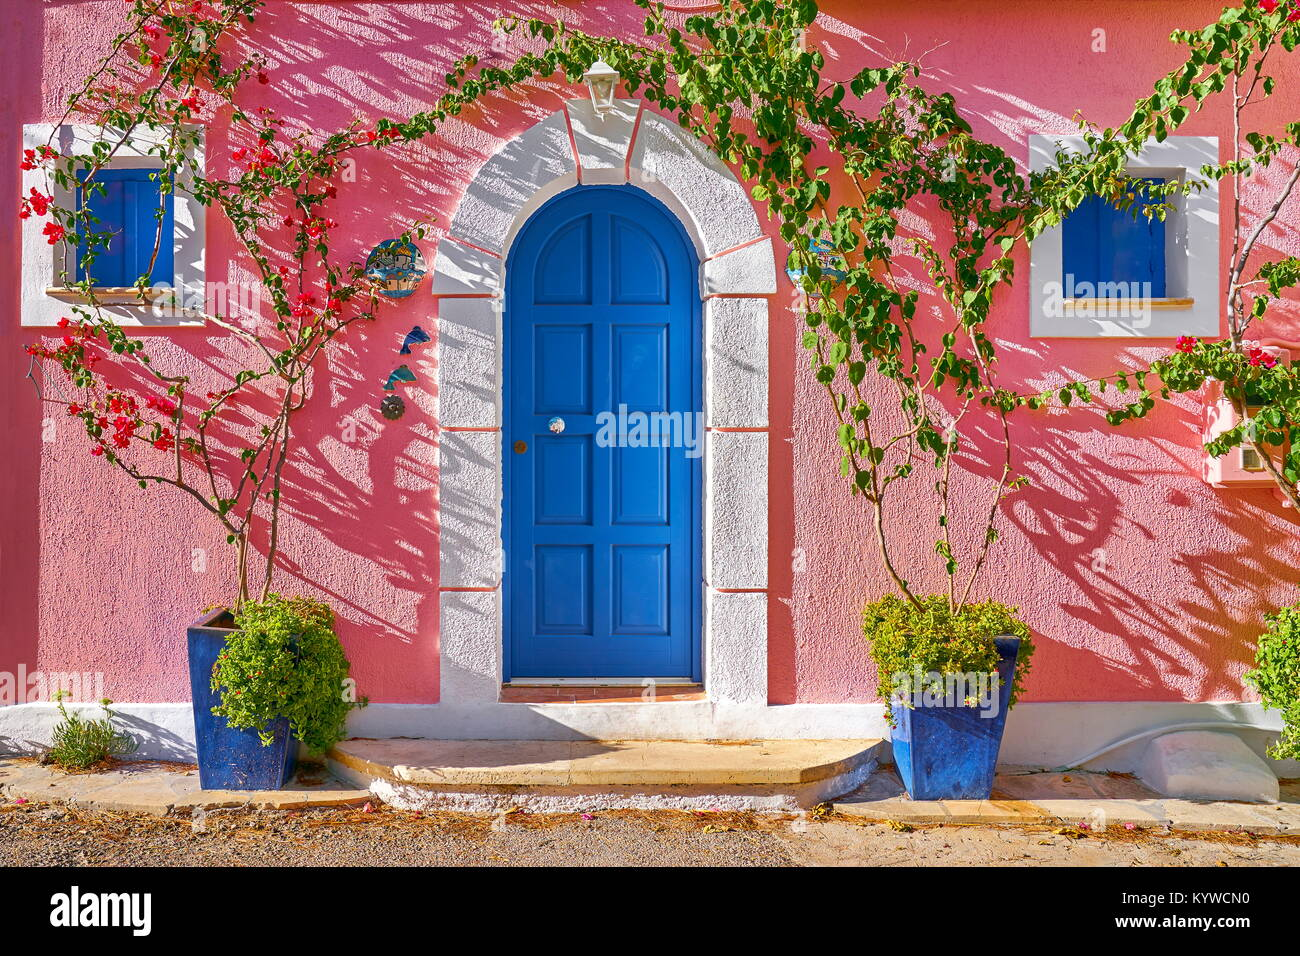 Greek house on the street in Assos village, Kefalonia Island, Greece - Stock Image